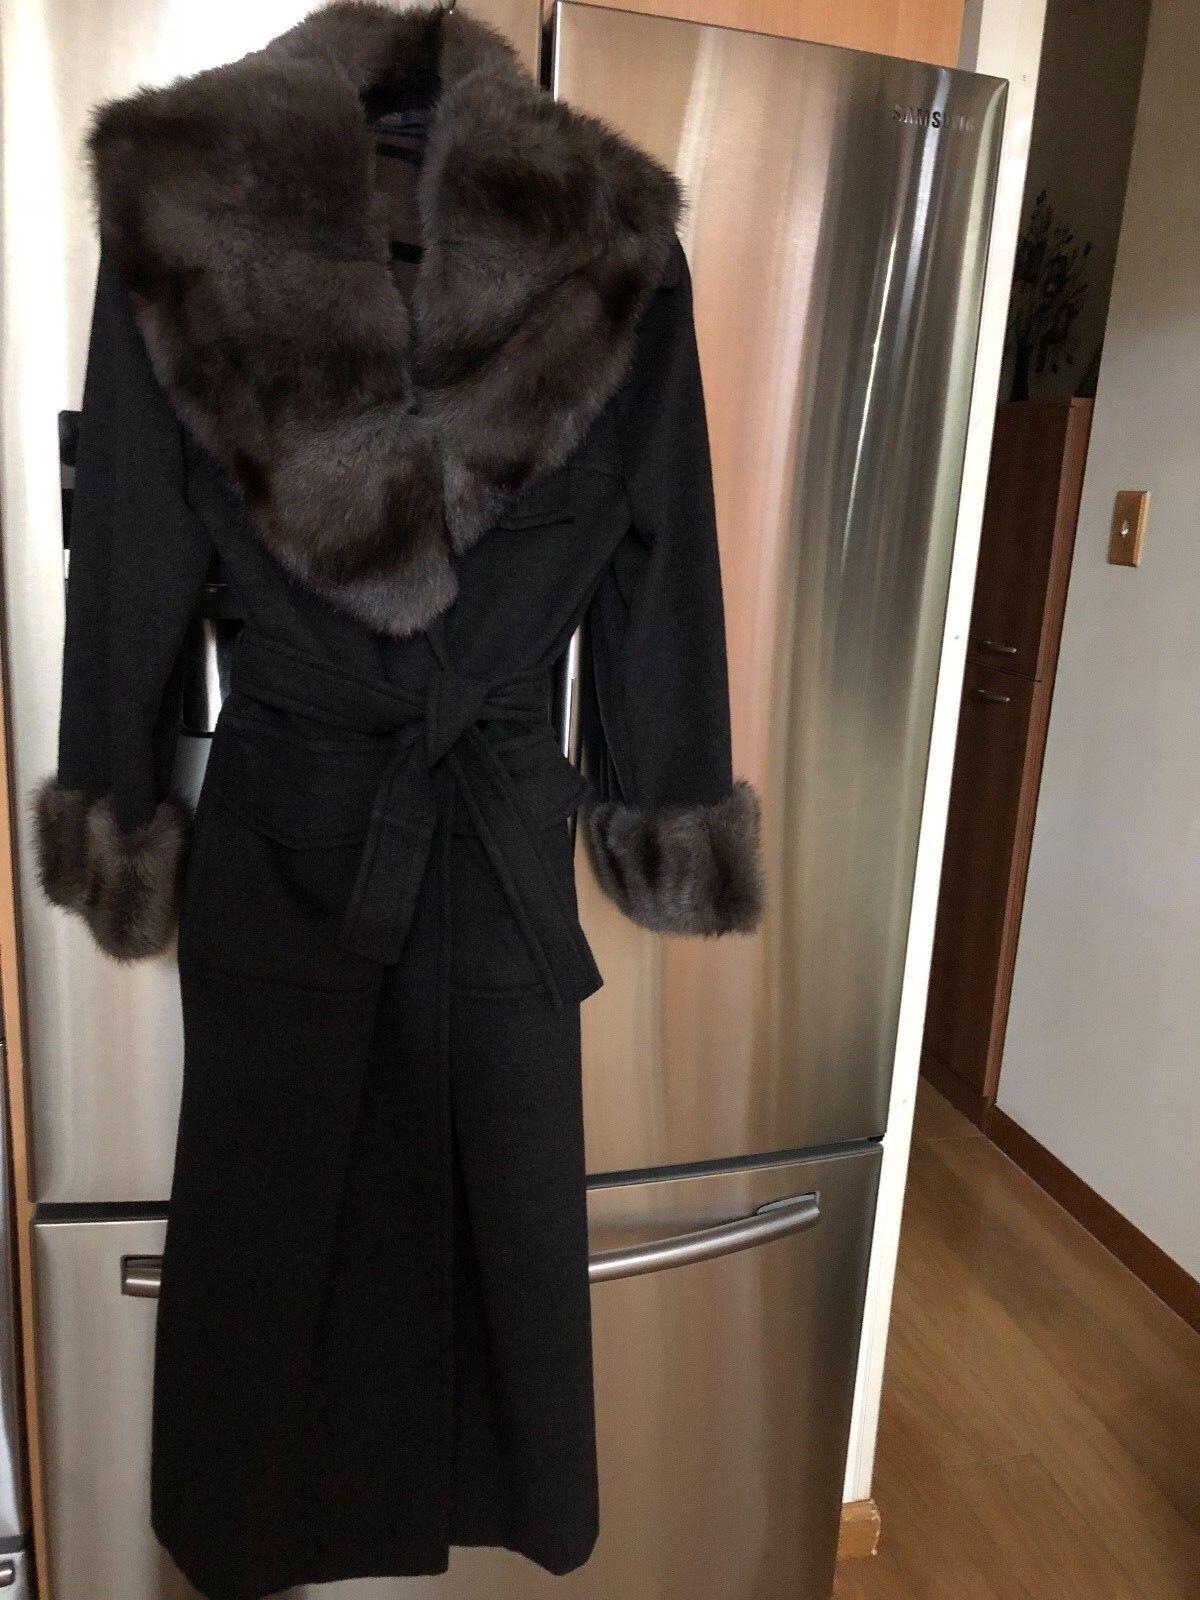 Italian Cashmere Wool Colombo Cashgora designer Coat with Fur, Size 12-14